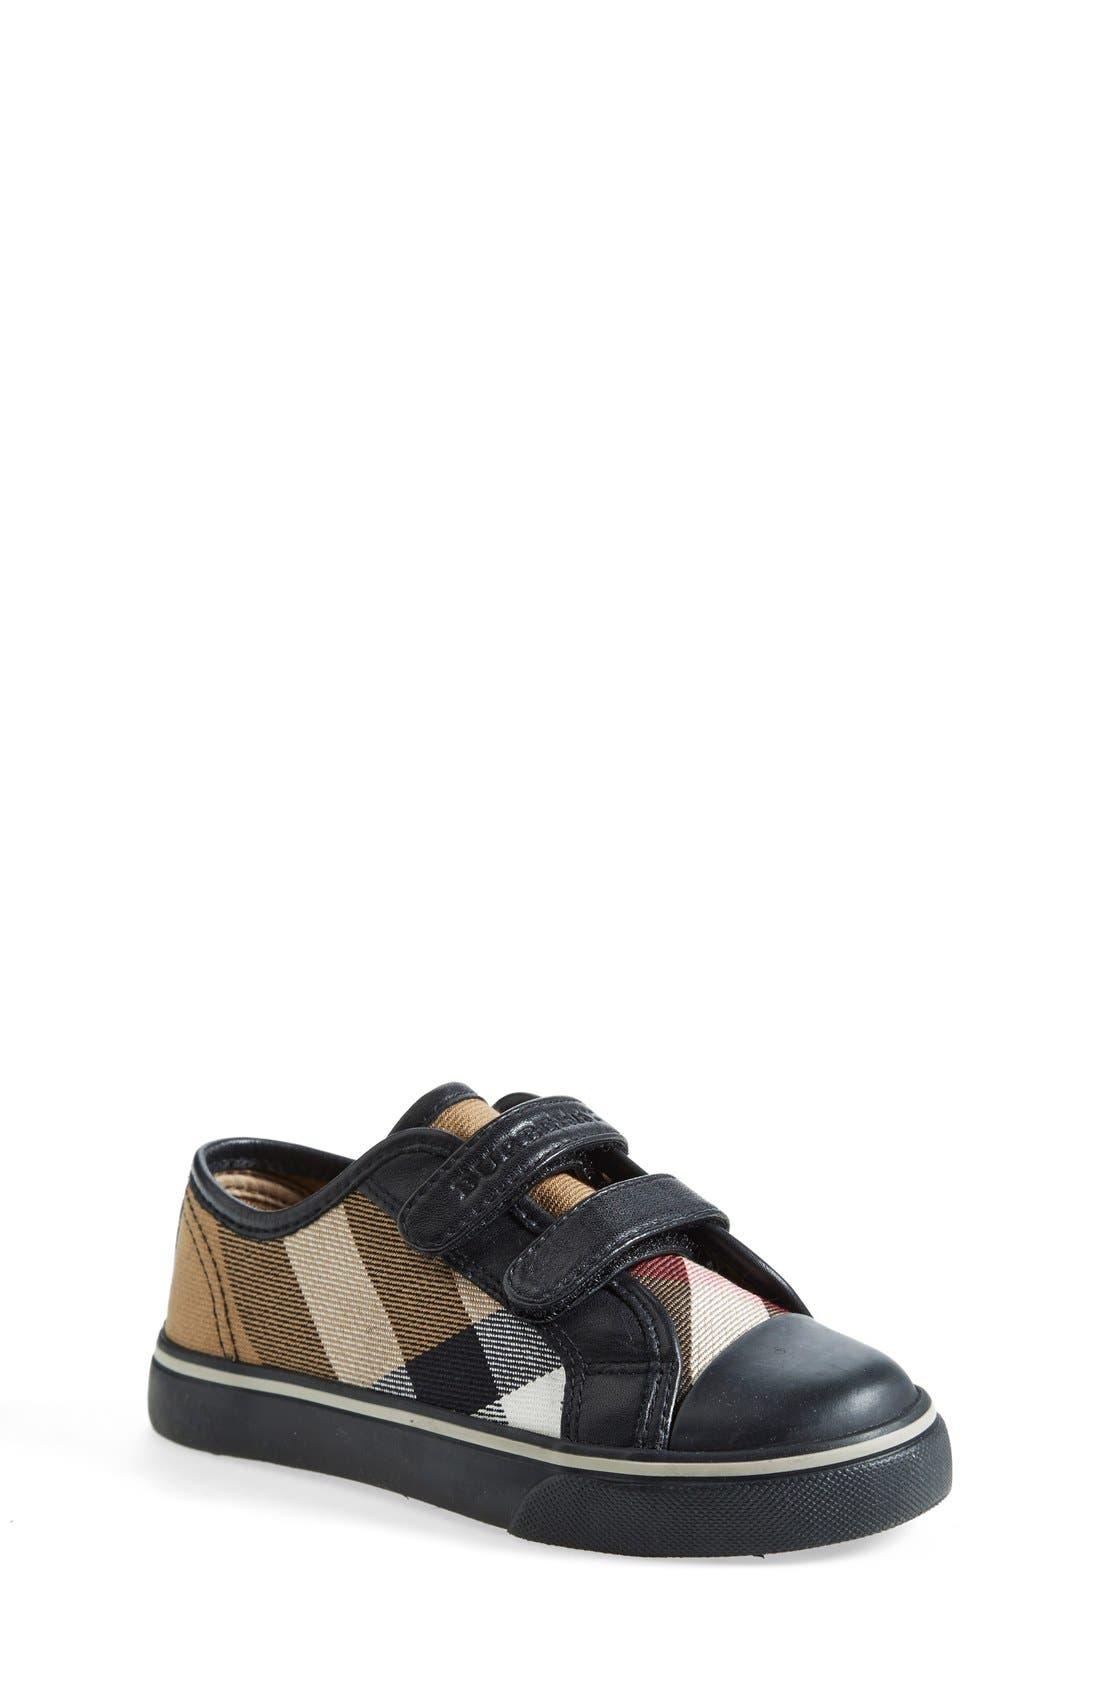 Main Image - Burberry 'Pete' Sneaker (Baby, Walker, Toddler &  Little Kid)